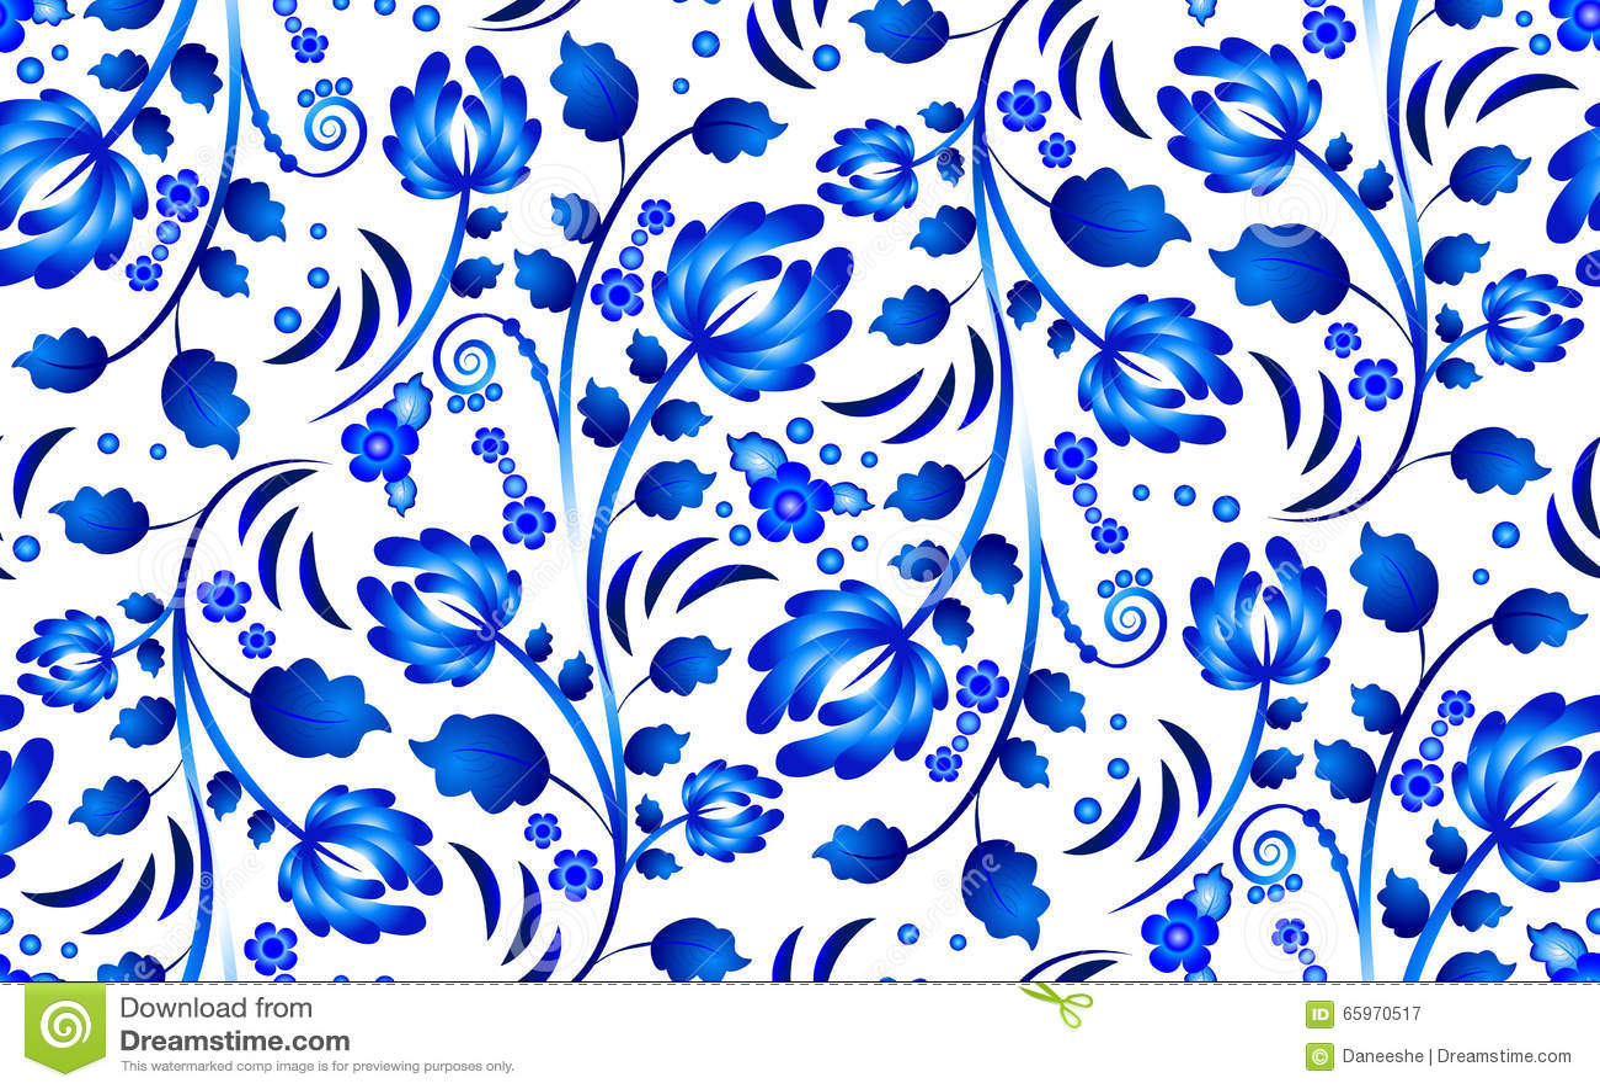 2f8efa16b369 Nahtloses Blumenmuster In Gzhel-Art Mit Blauen Blumen Vektor ...